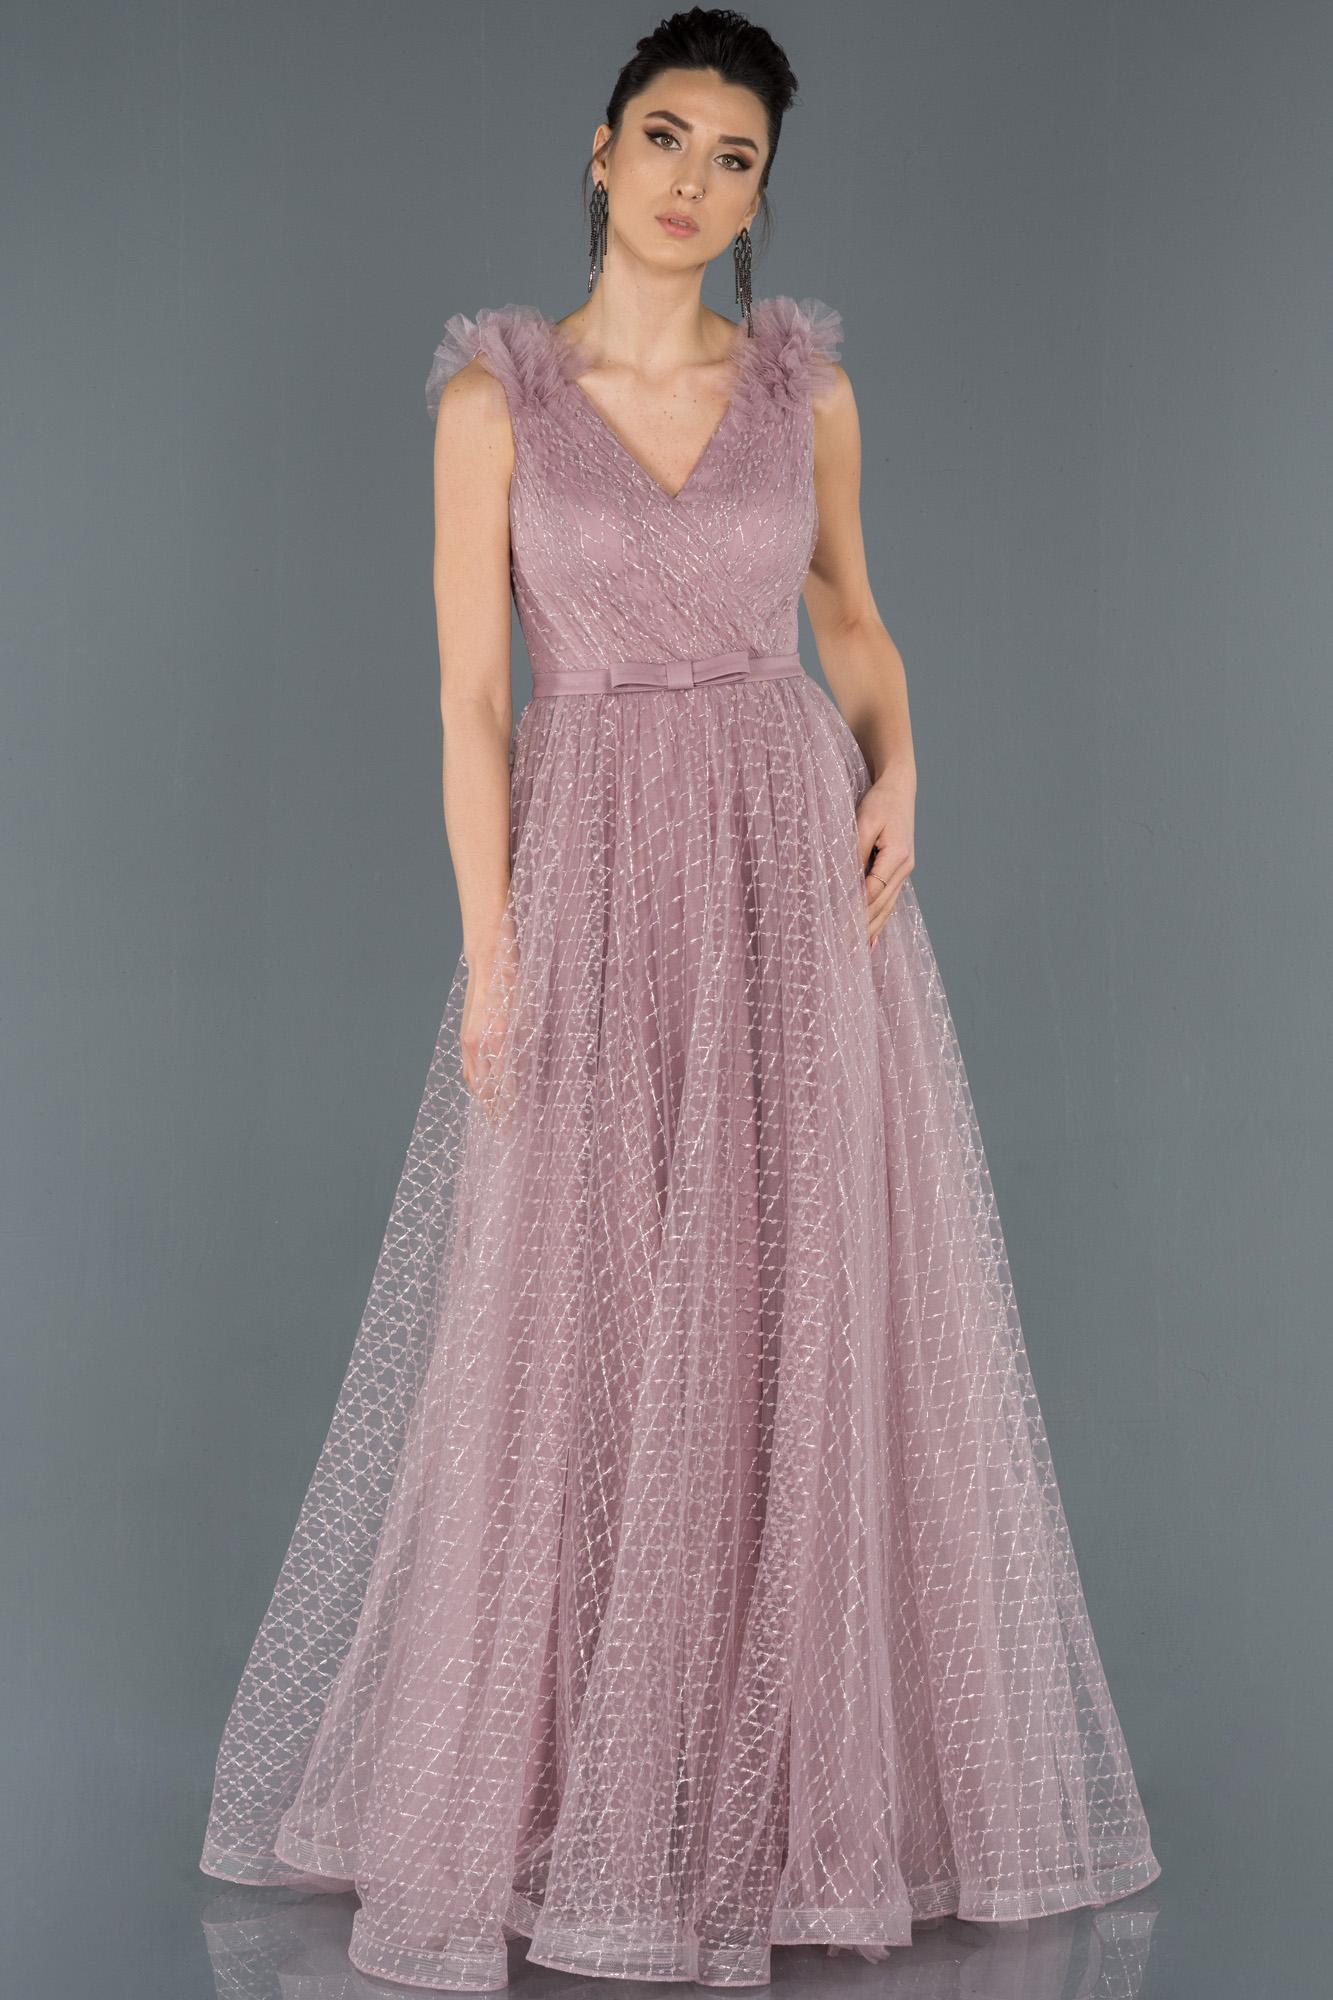 Pudra V Yaka Sim Detaylı Prenses Abiye Elbise